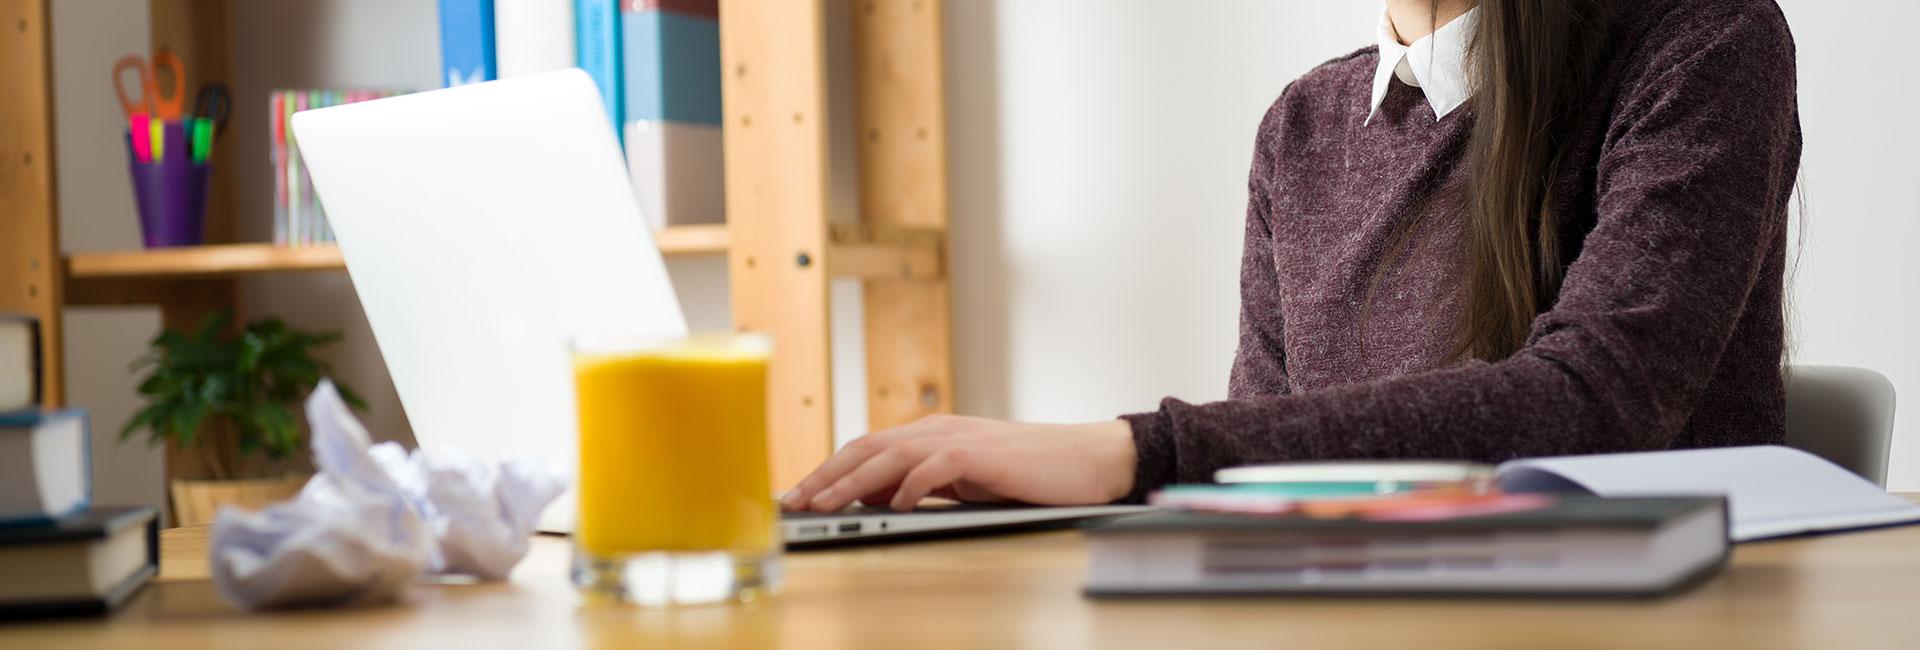 Blogging service los angeles digital marketing agency